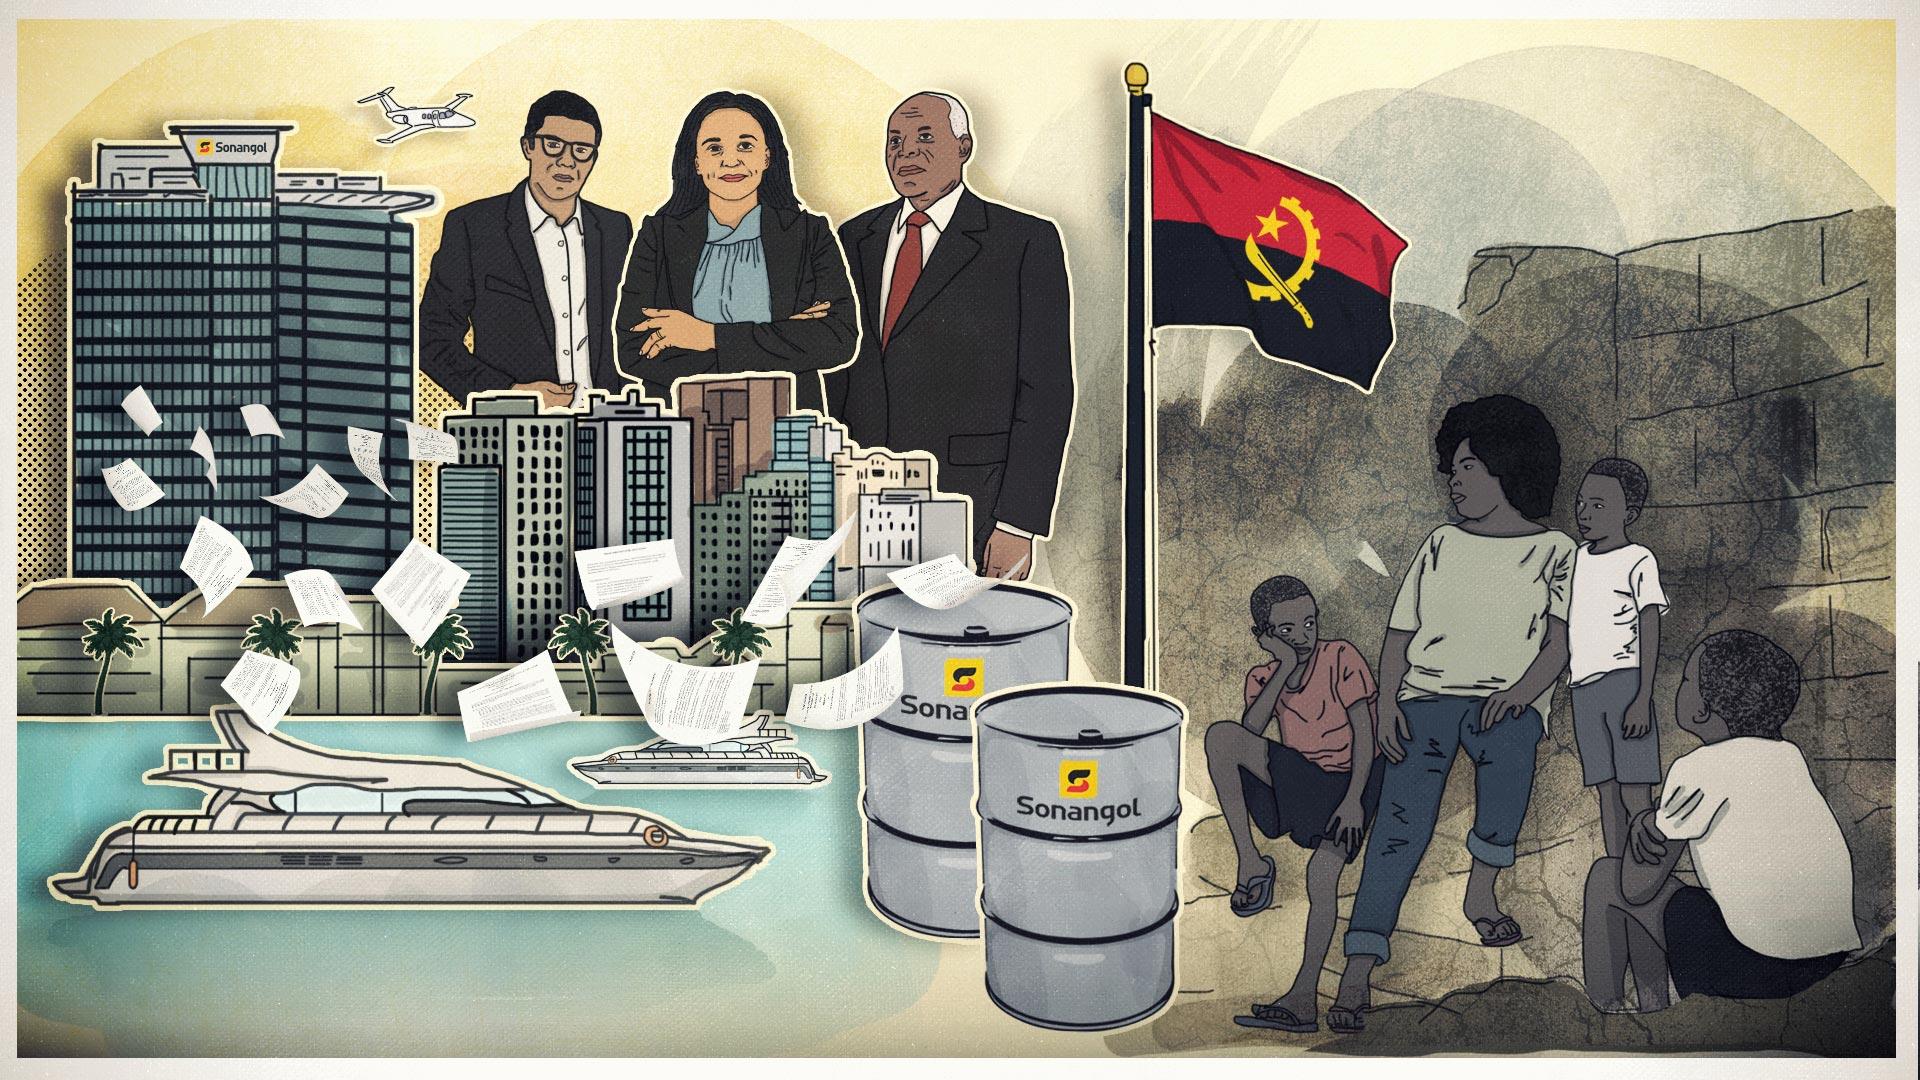 Luanda Leaks - investigation by ICIJ